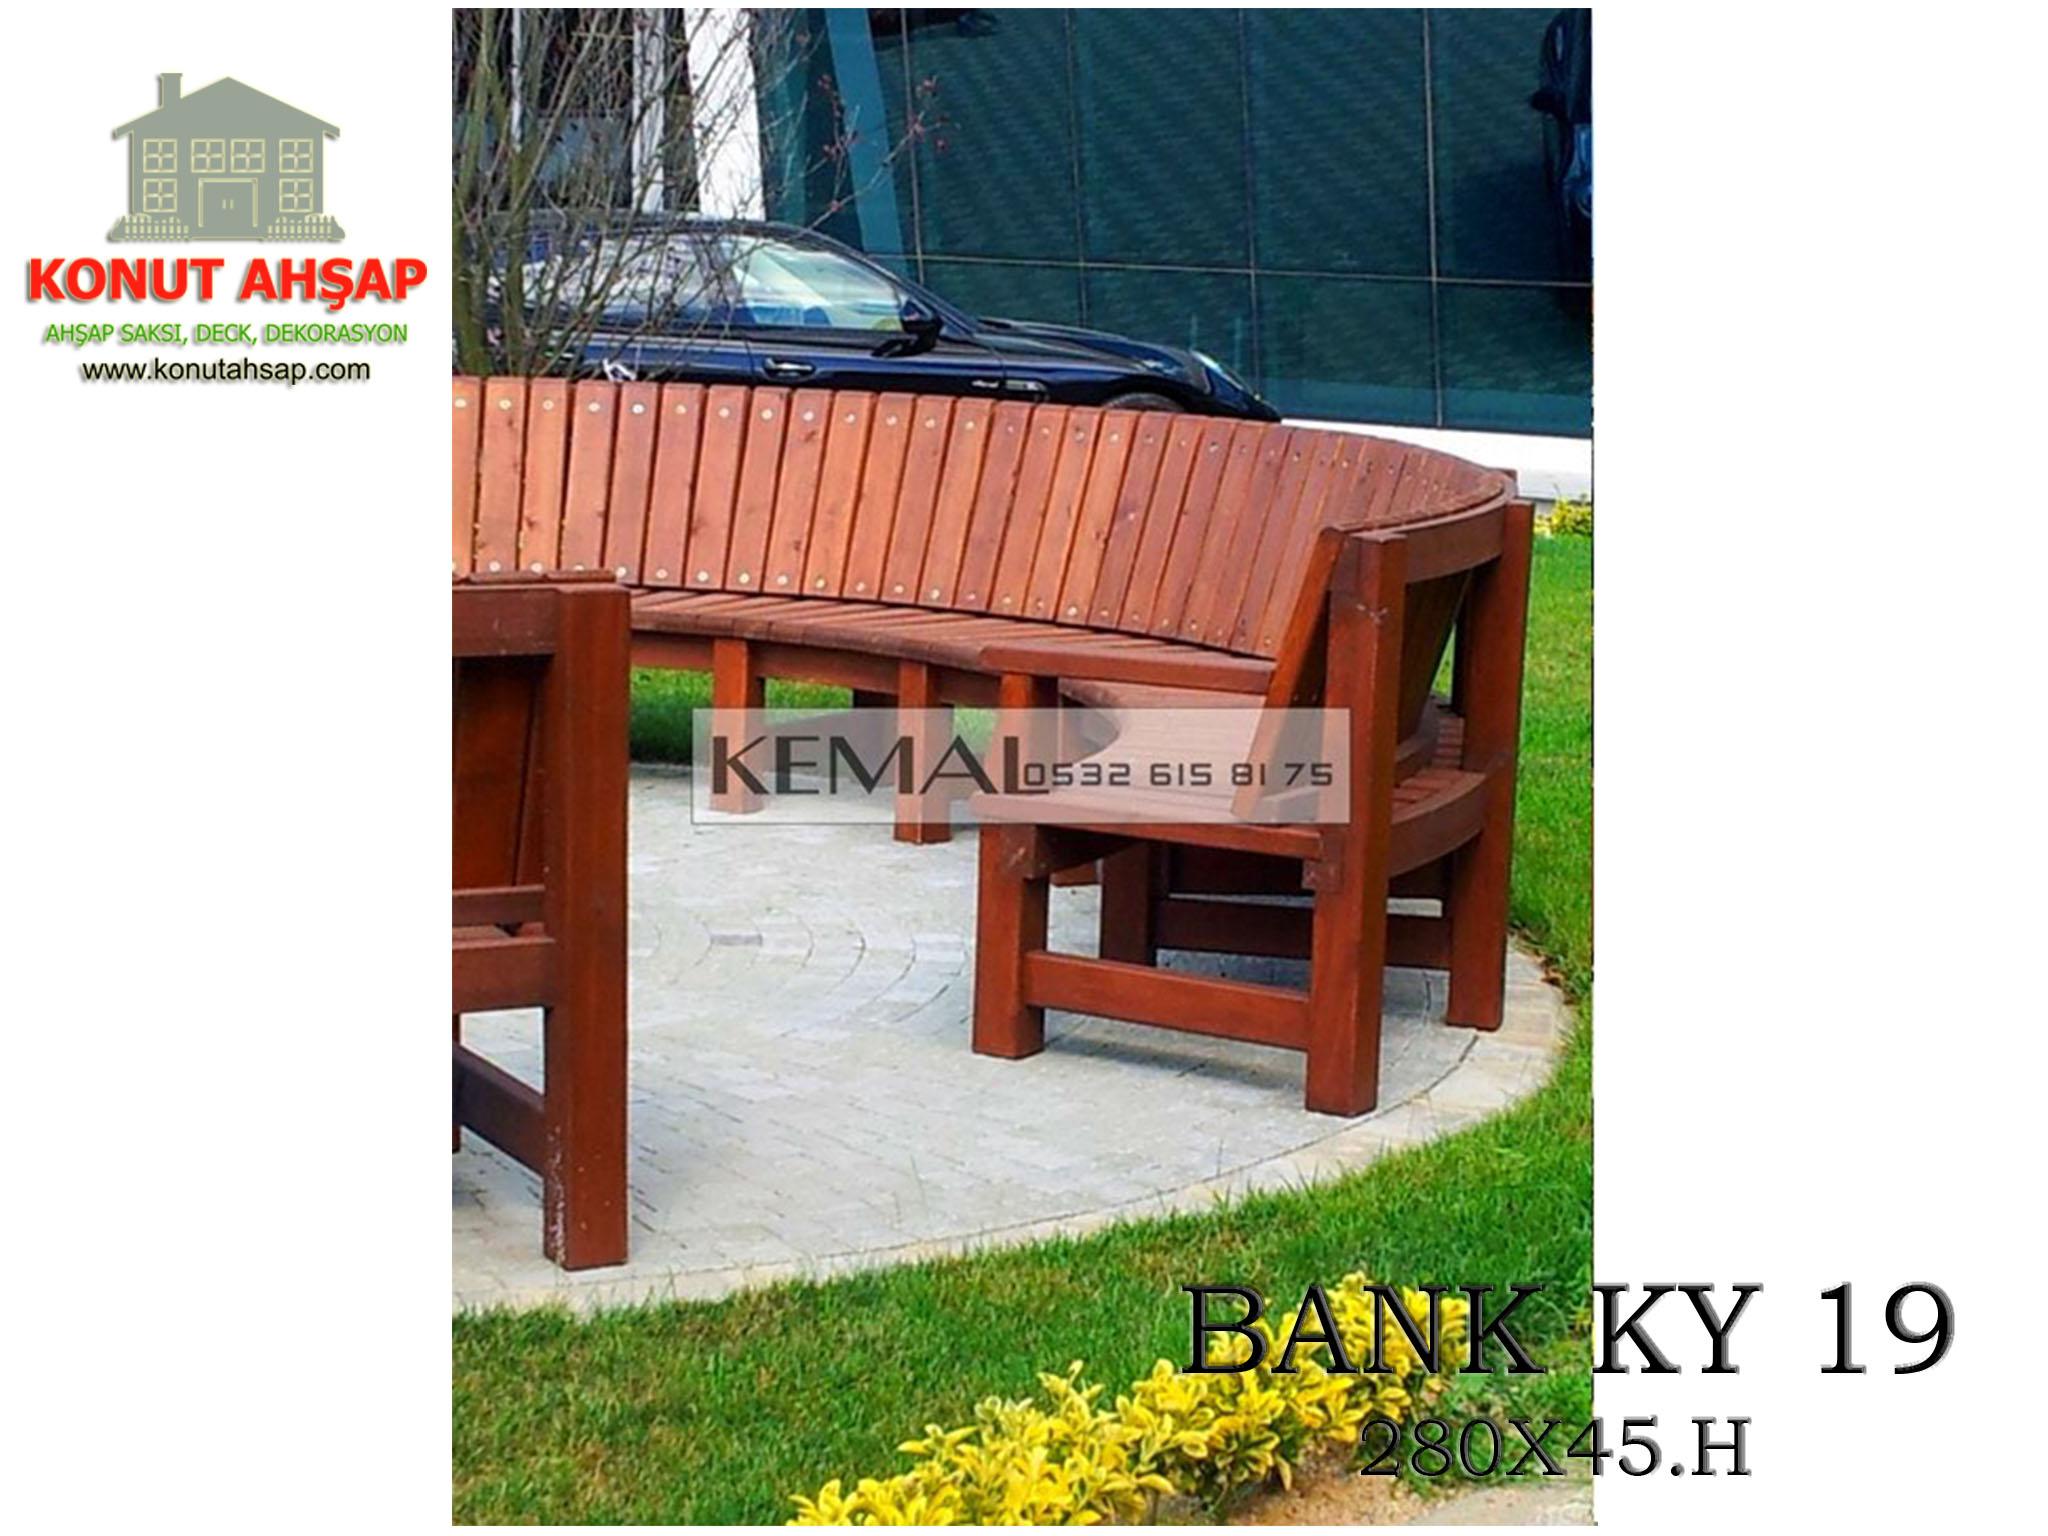 BANK KY 19